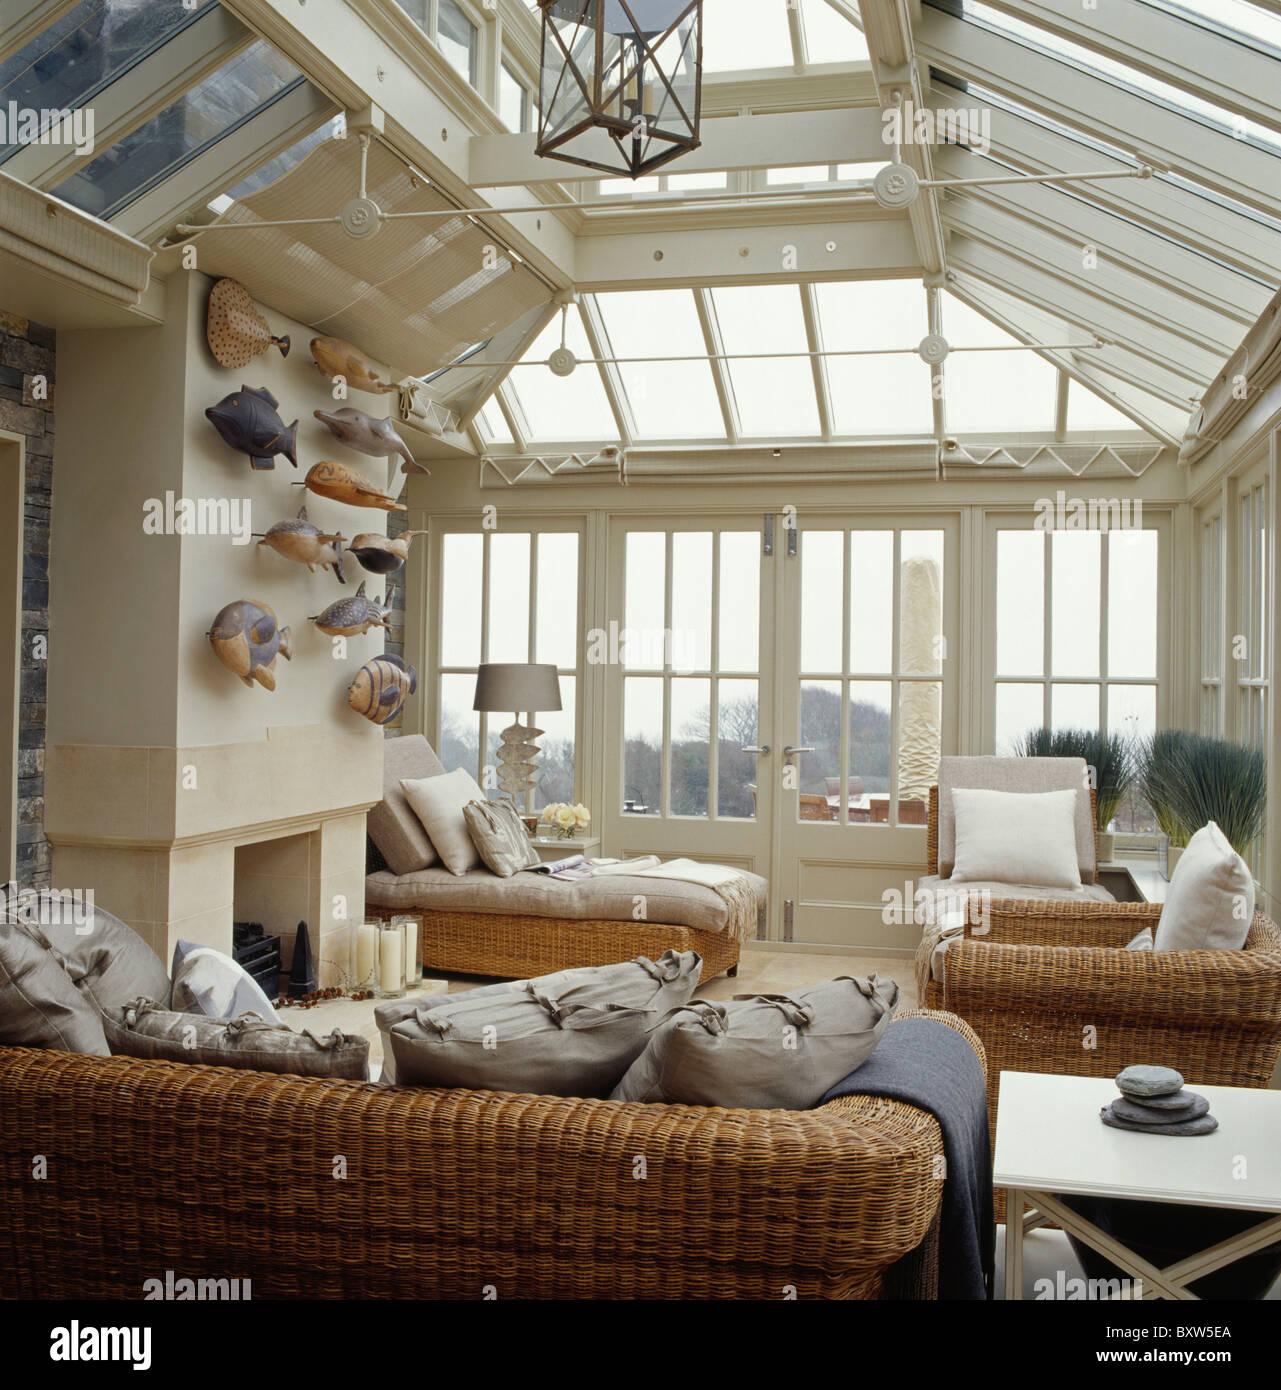 Les Canapes En Osier Grande Veranda Salon Extension Avec